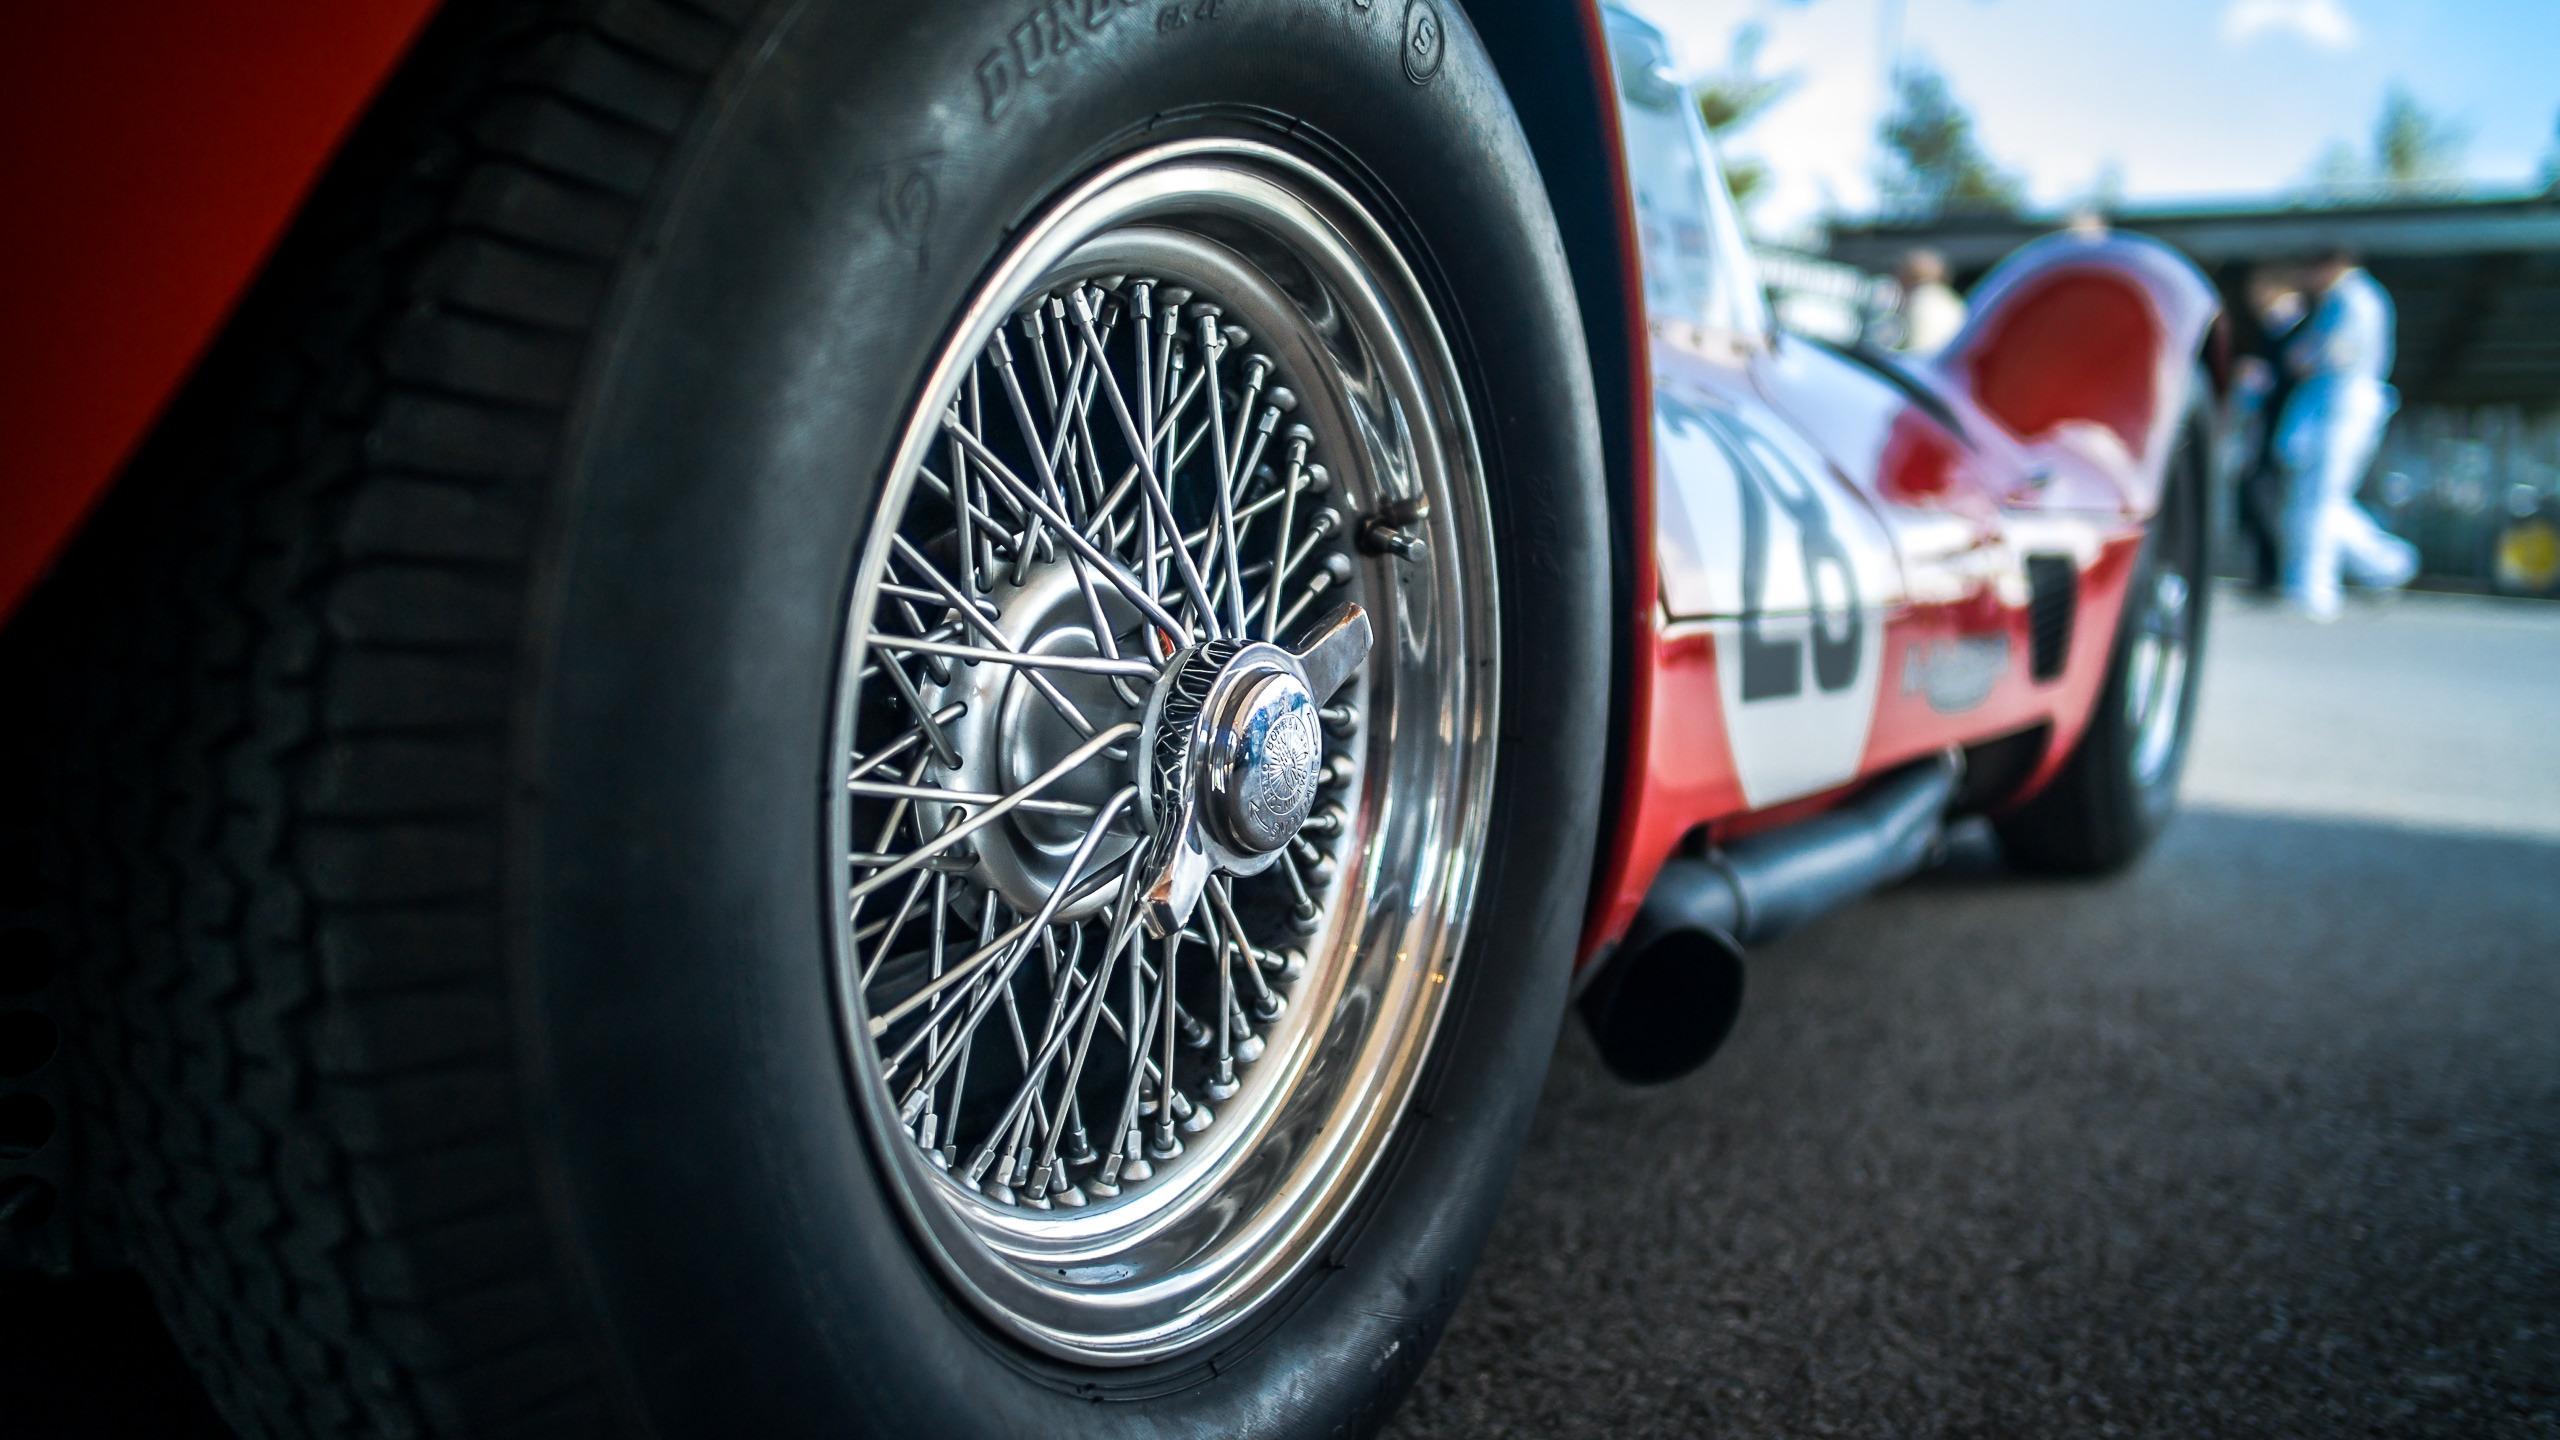 Wayfinder Workshop Goodwood Revival Ferrari Paddock 21Mm Summliux By Brett Leica Photographer